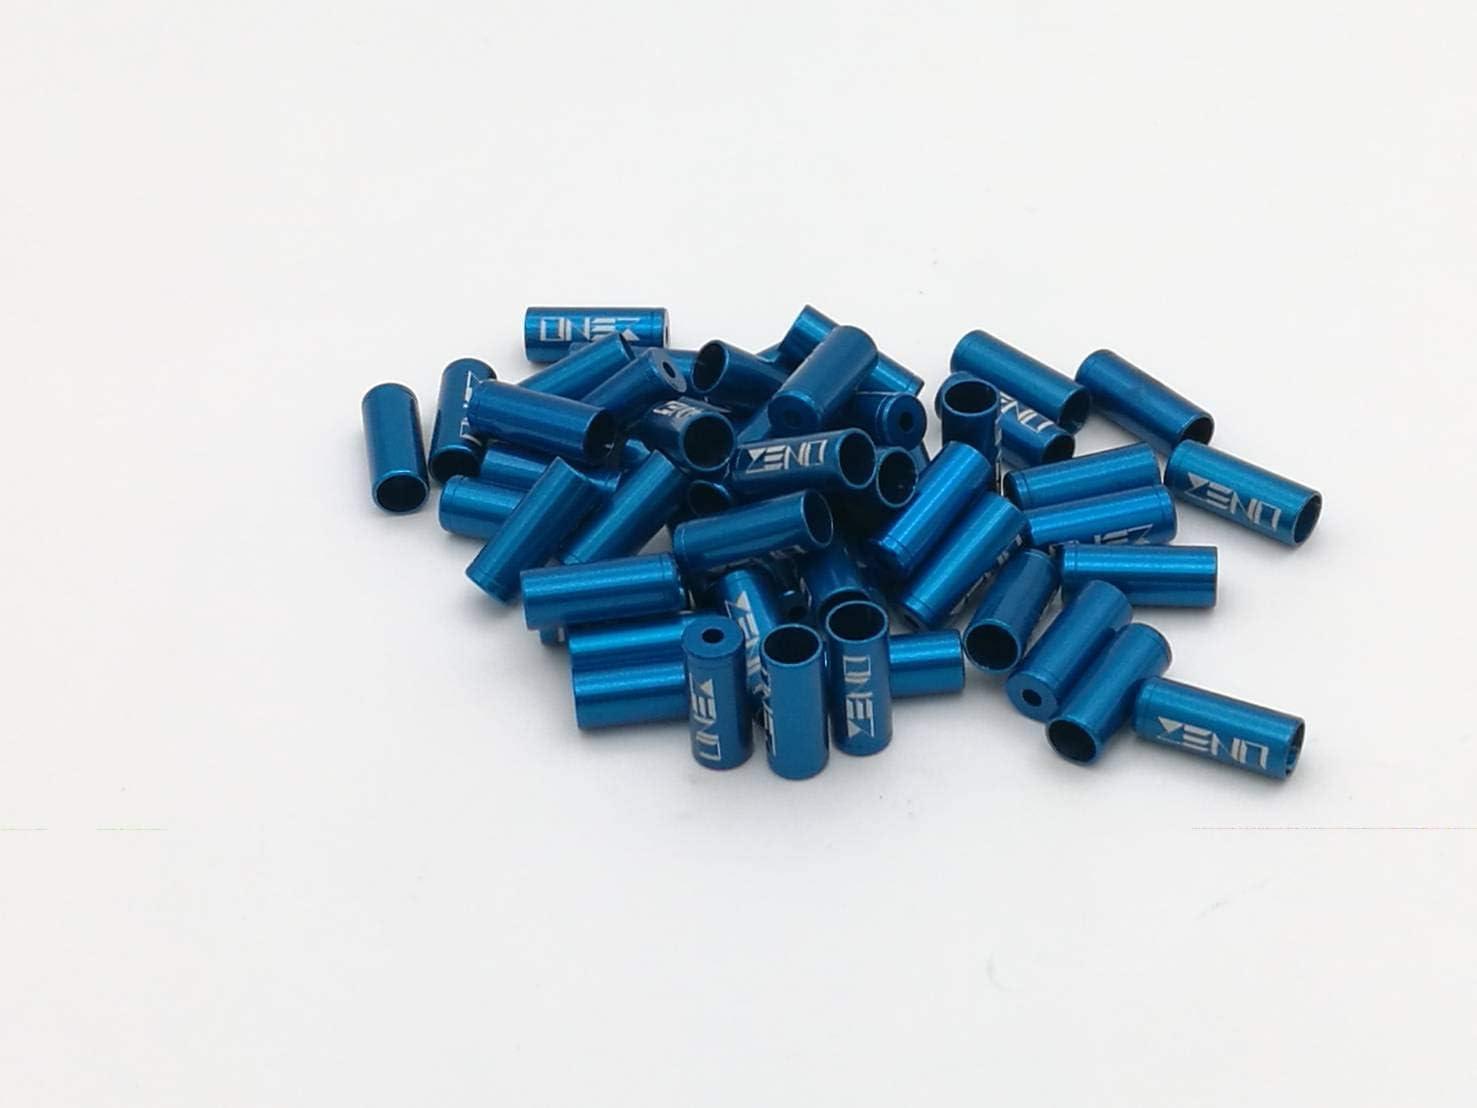 10 PCS BIKE BICYCLE ALUMINUM BRAKE HOUSING FERRULES CAPS 5mm NEW BLUE